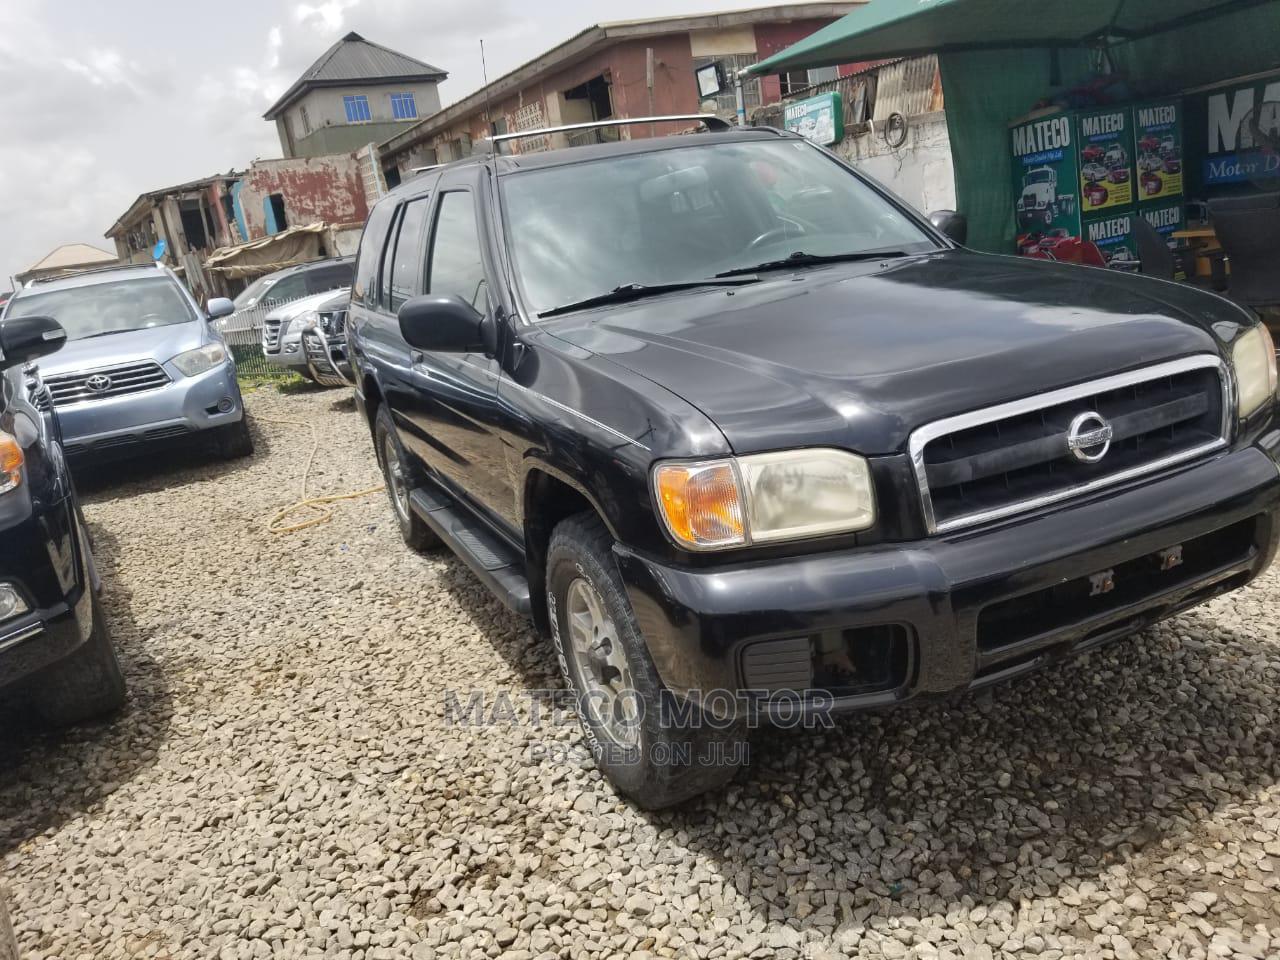 Nissan Pathfinder 2003 SE AWD SUV (3.5L 6cyl 4A) Black   Cars for sale in Amuwo-Odofin, Lagos State, Nigeria